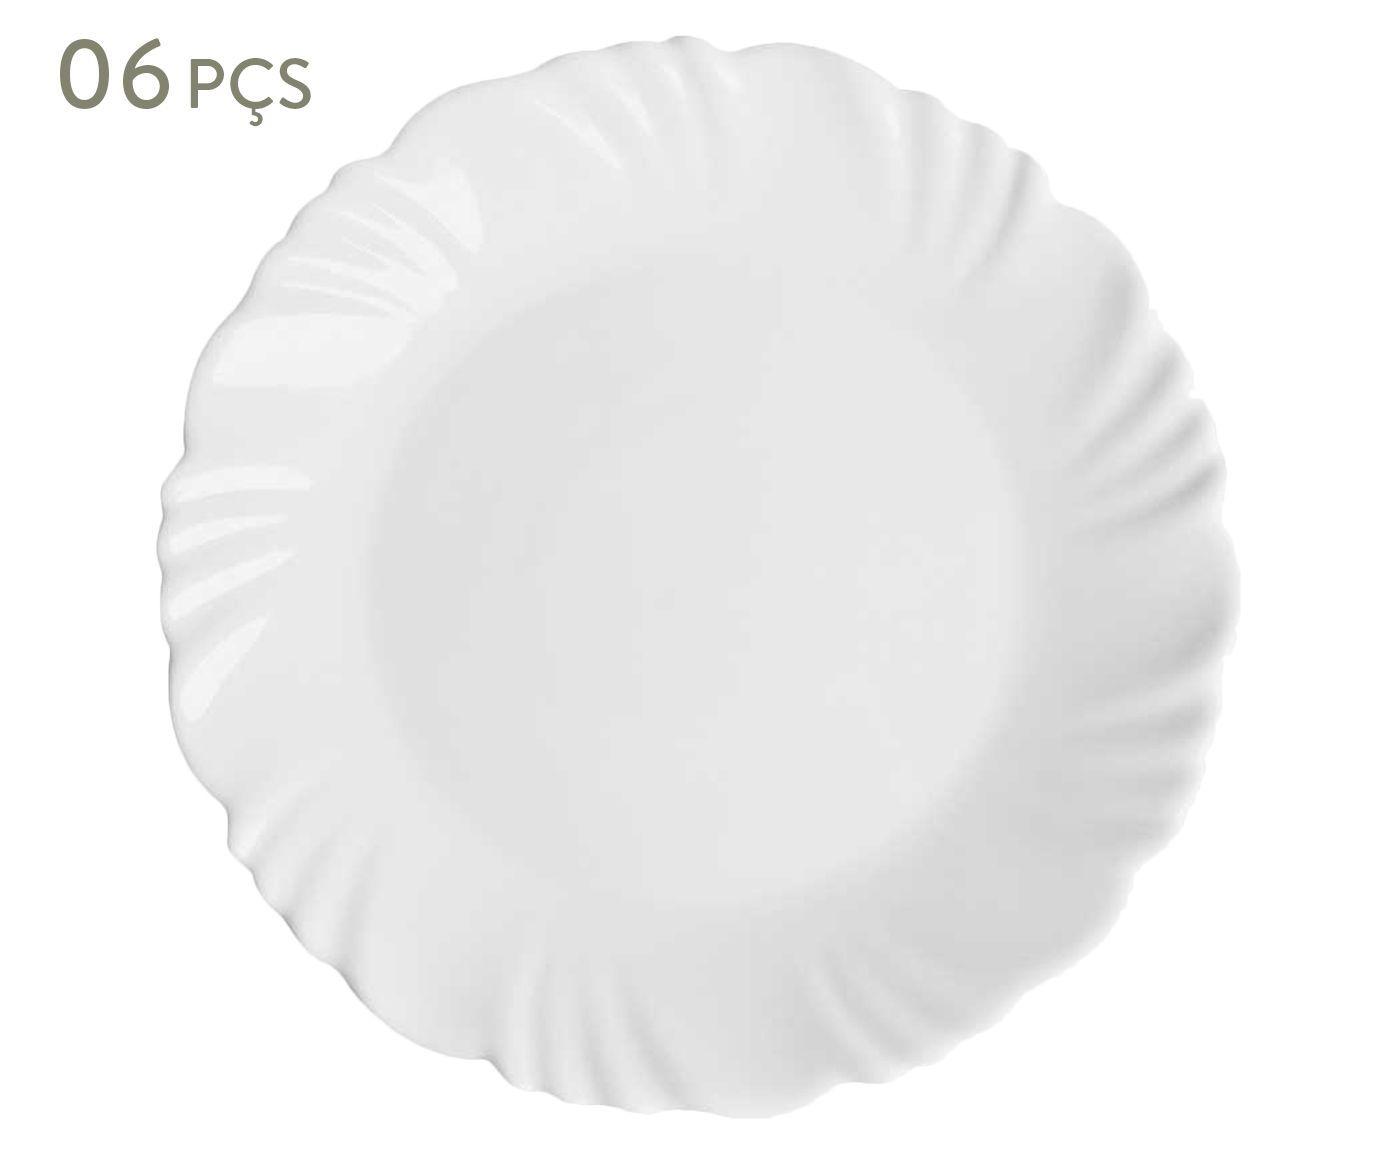 Conjunto de pratos para sobremesa bott - duralex | Westwing.com.br